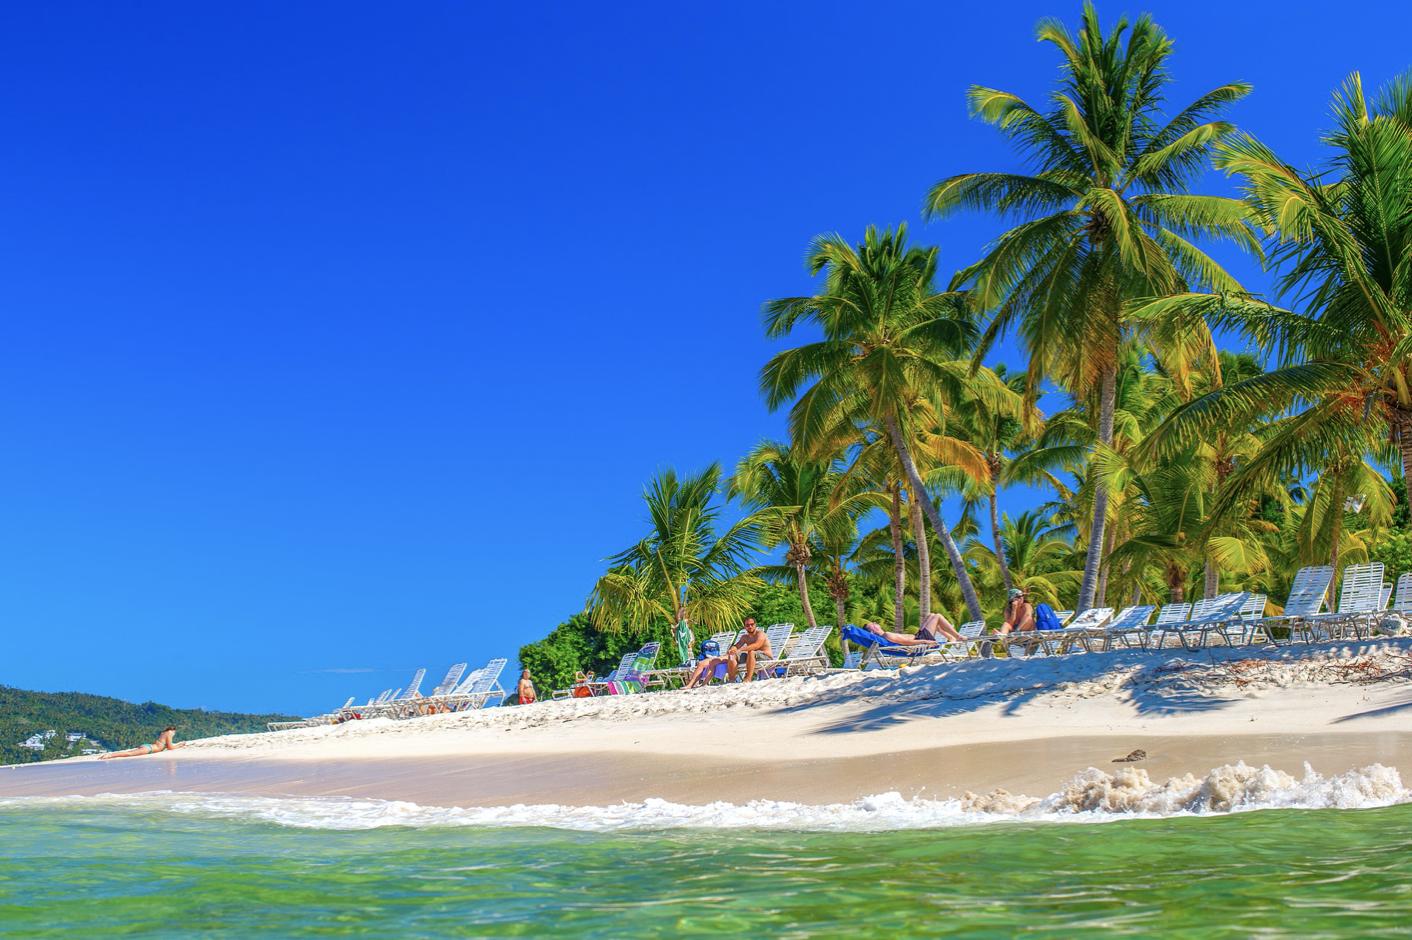 Punta Cana, Dominican Republic in 2020 Countries in